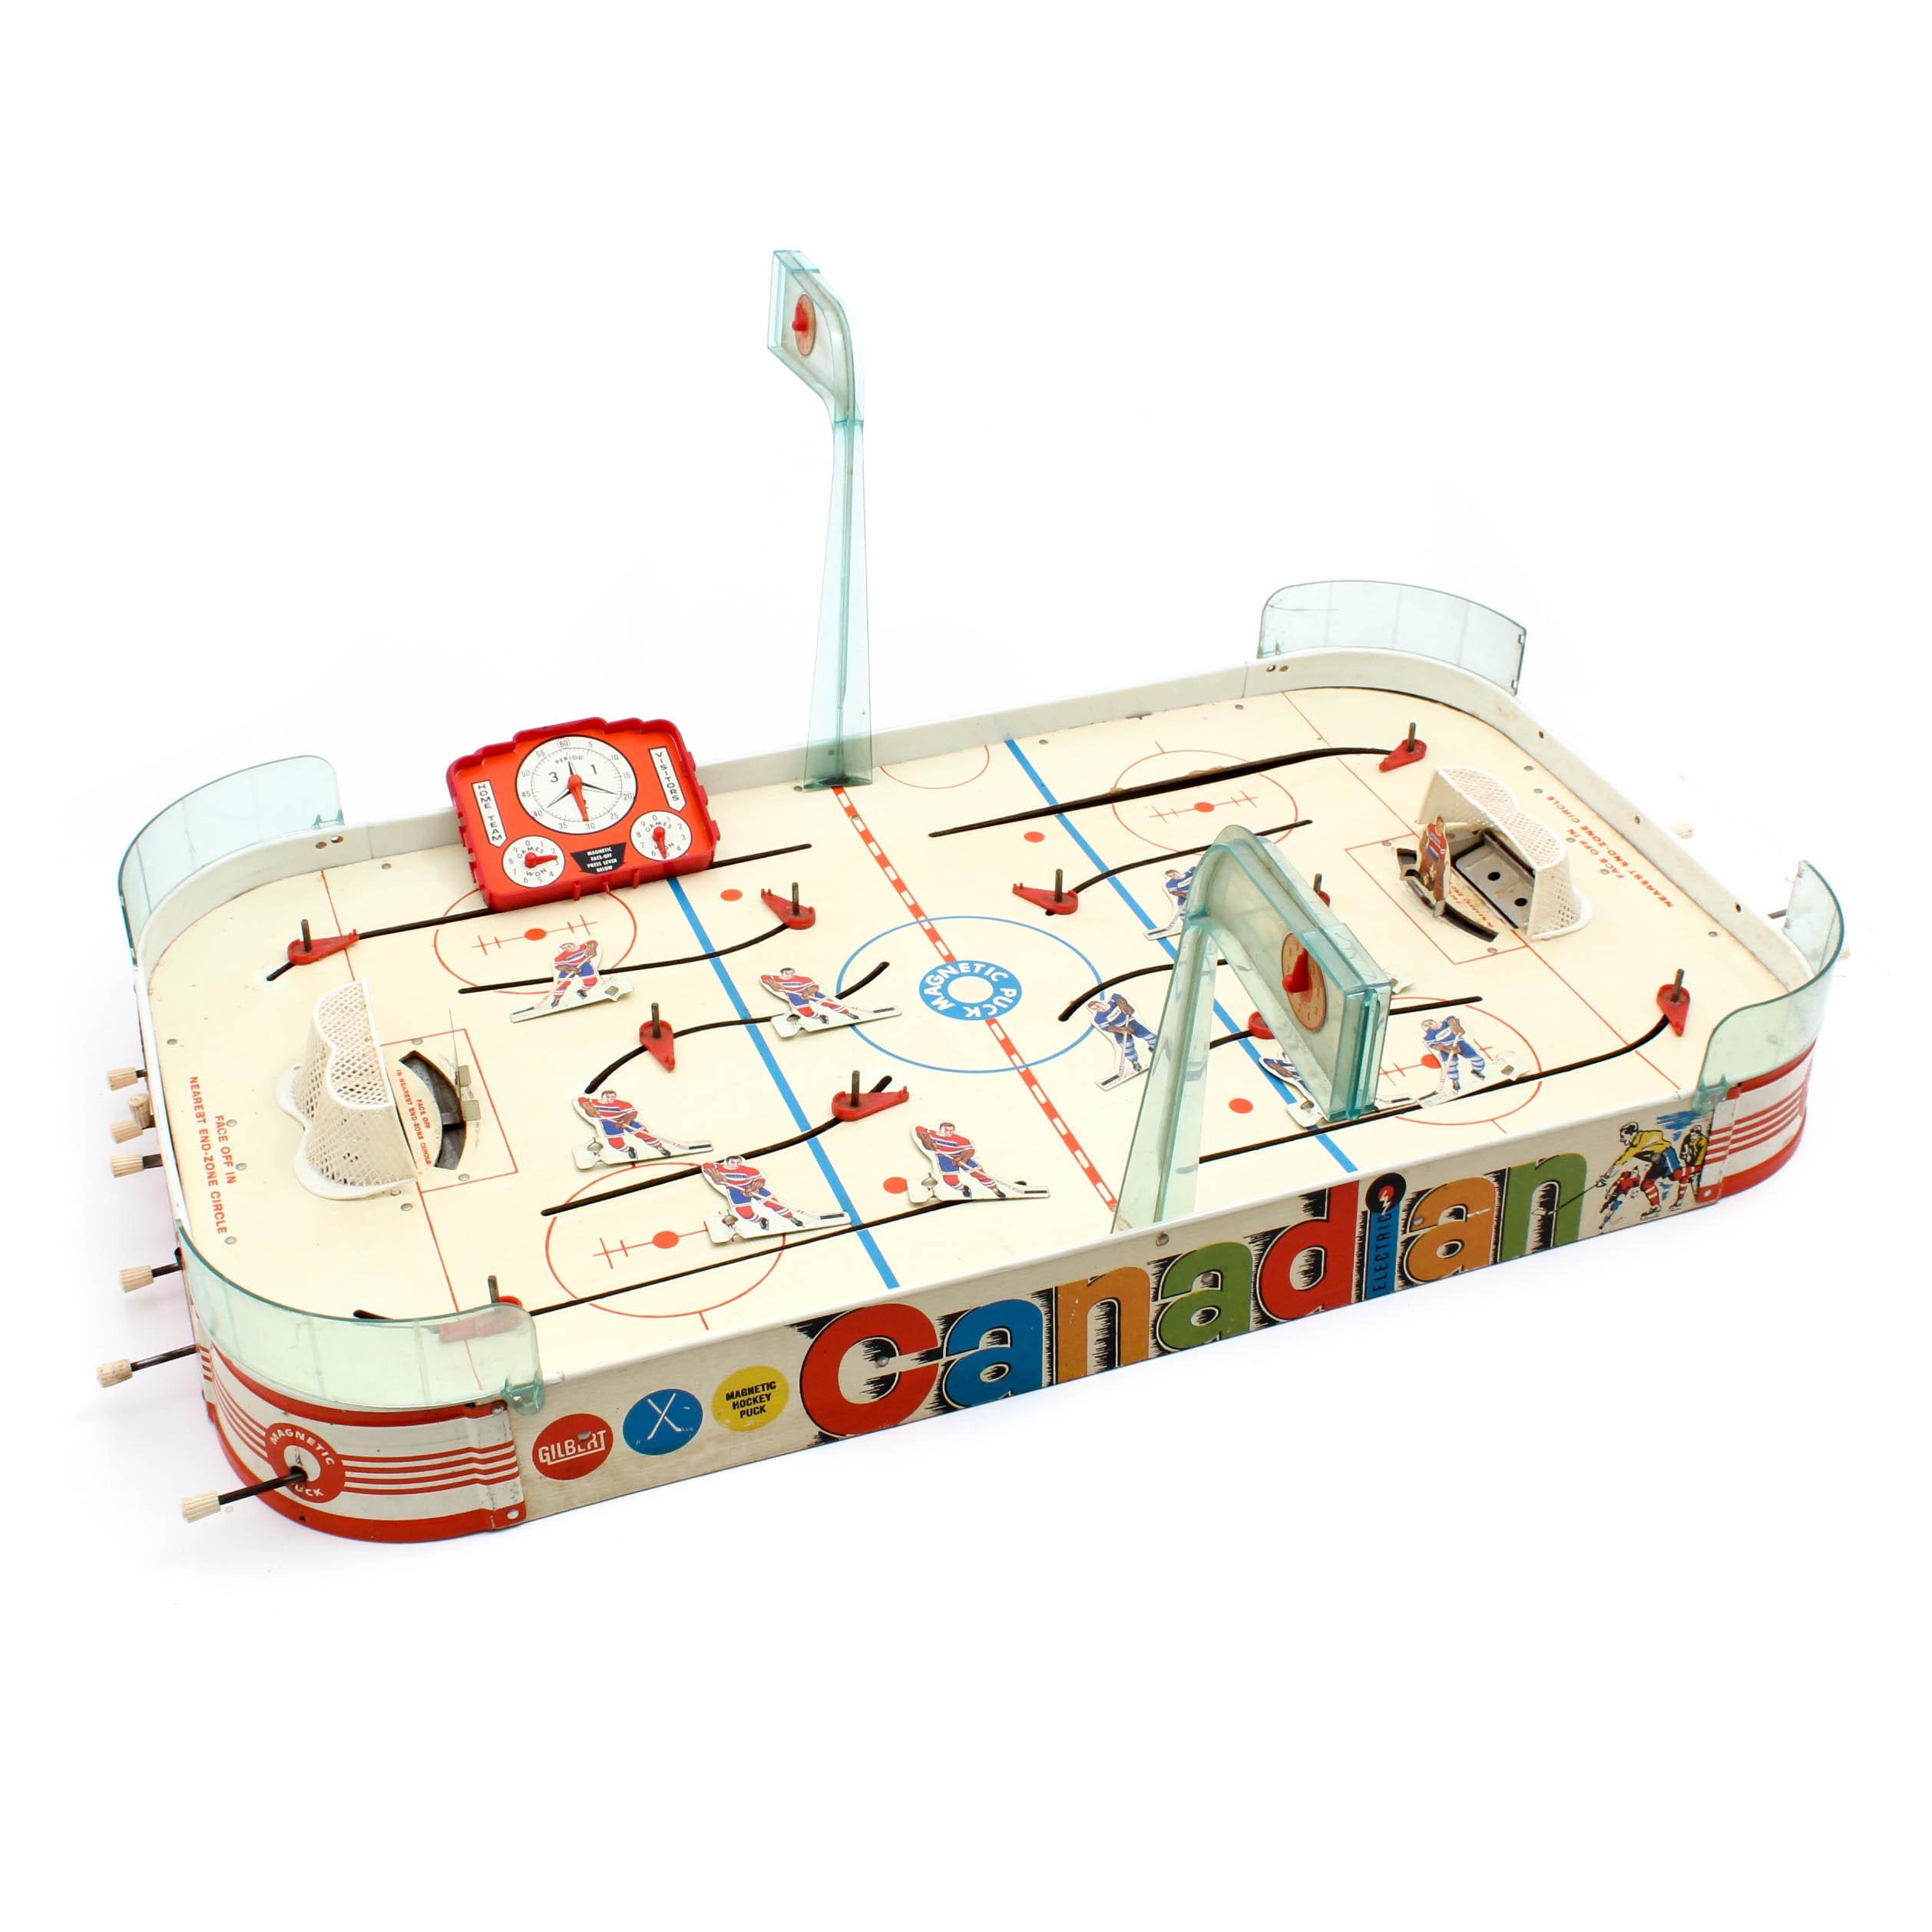 Vintage Gilbert Electric Hockey Game